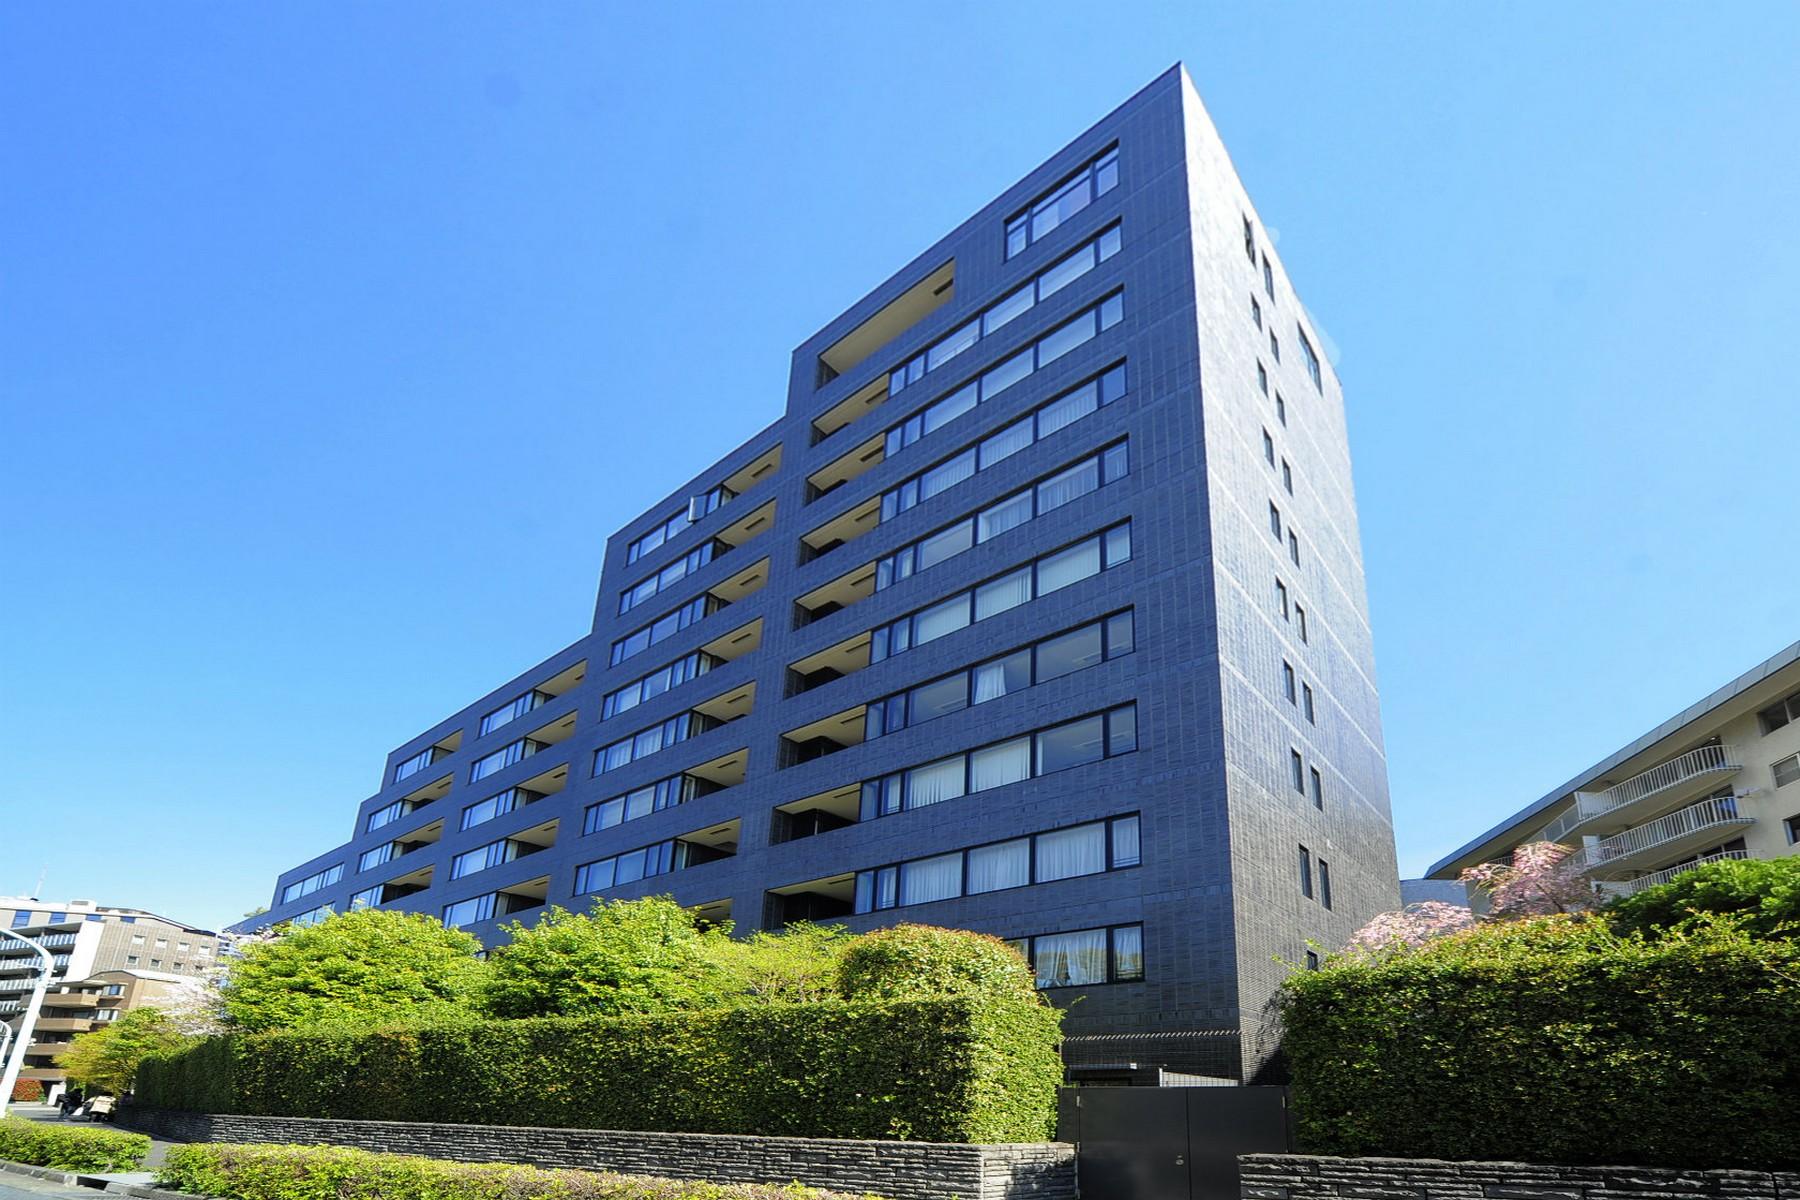 Property For Sale at Minami-Aoyama Terrace Tokiwamatsu Forest